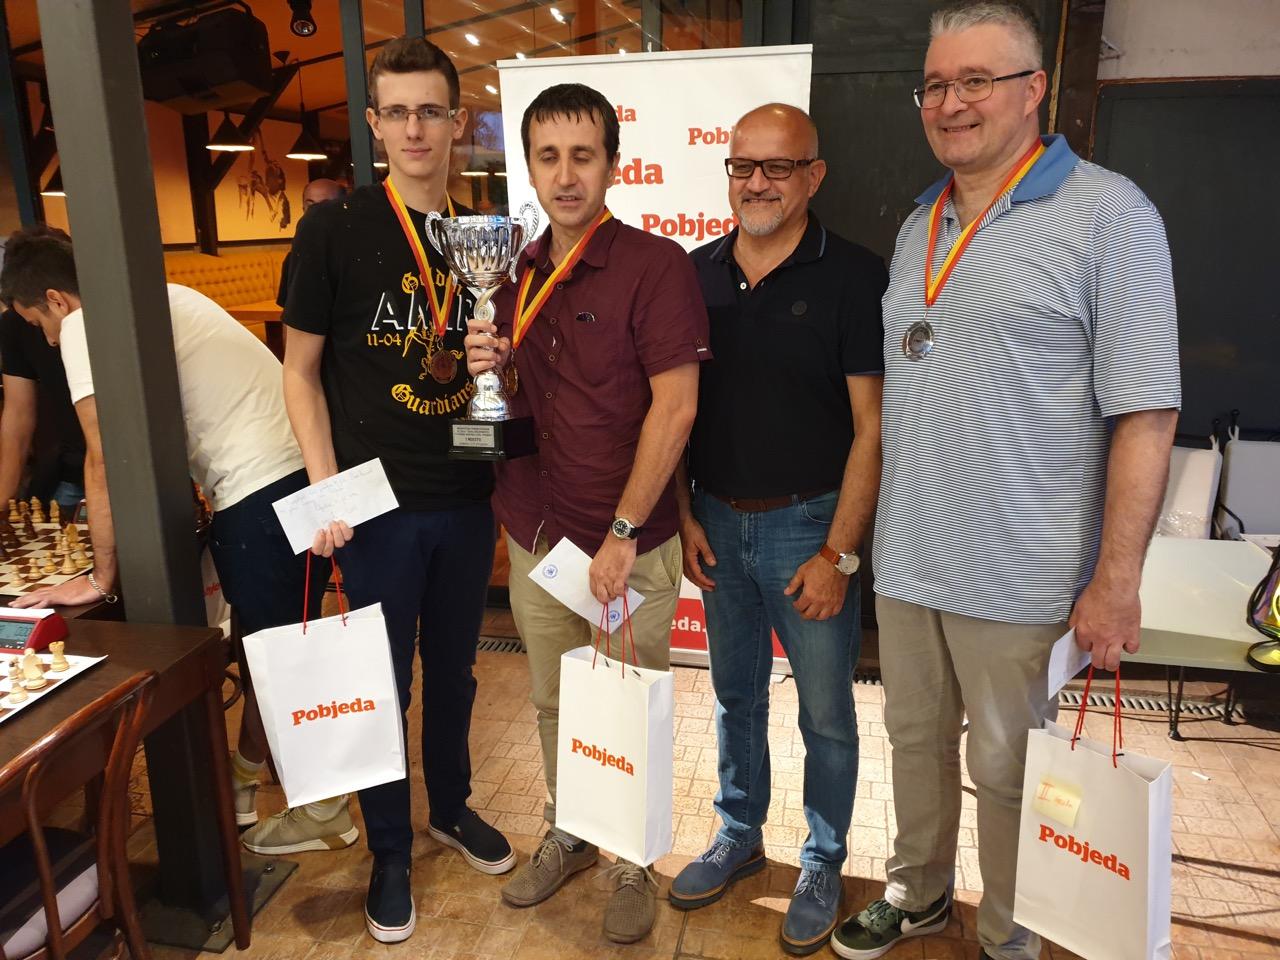 Povodom 13. jula organizovani brzopotezni šahovski turniri